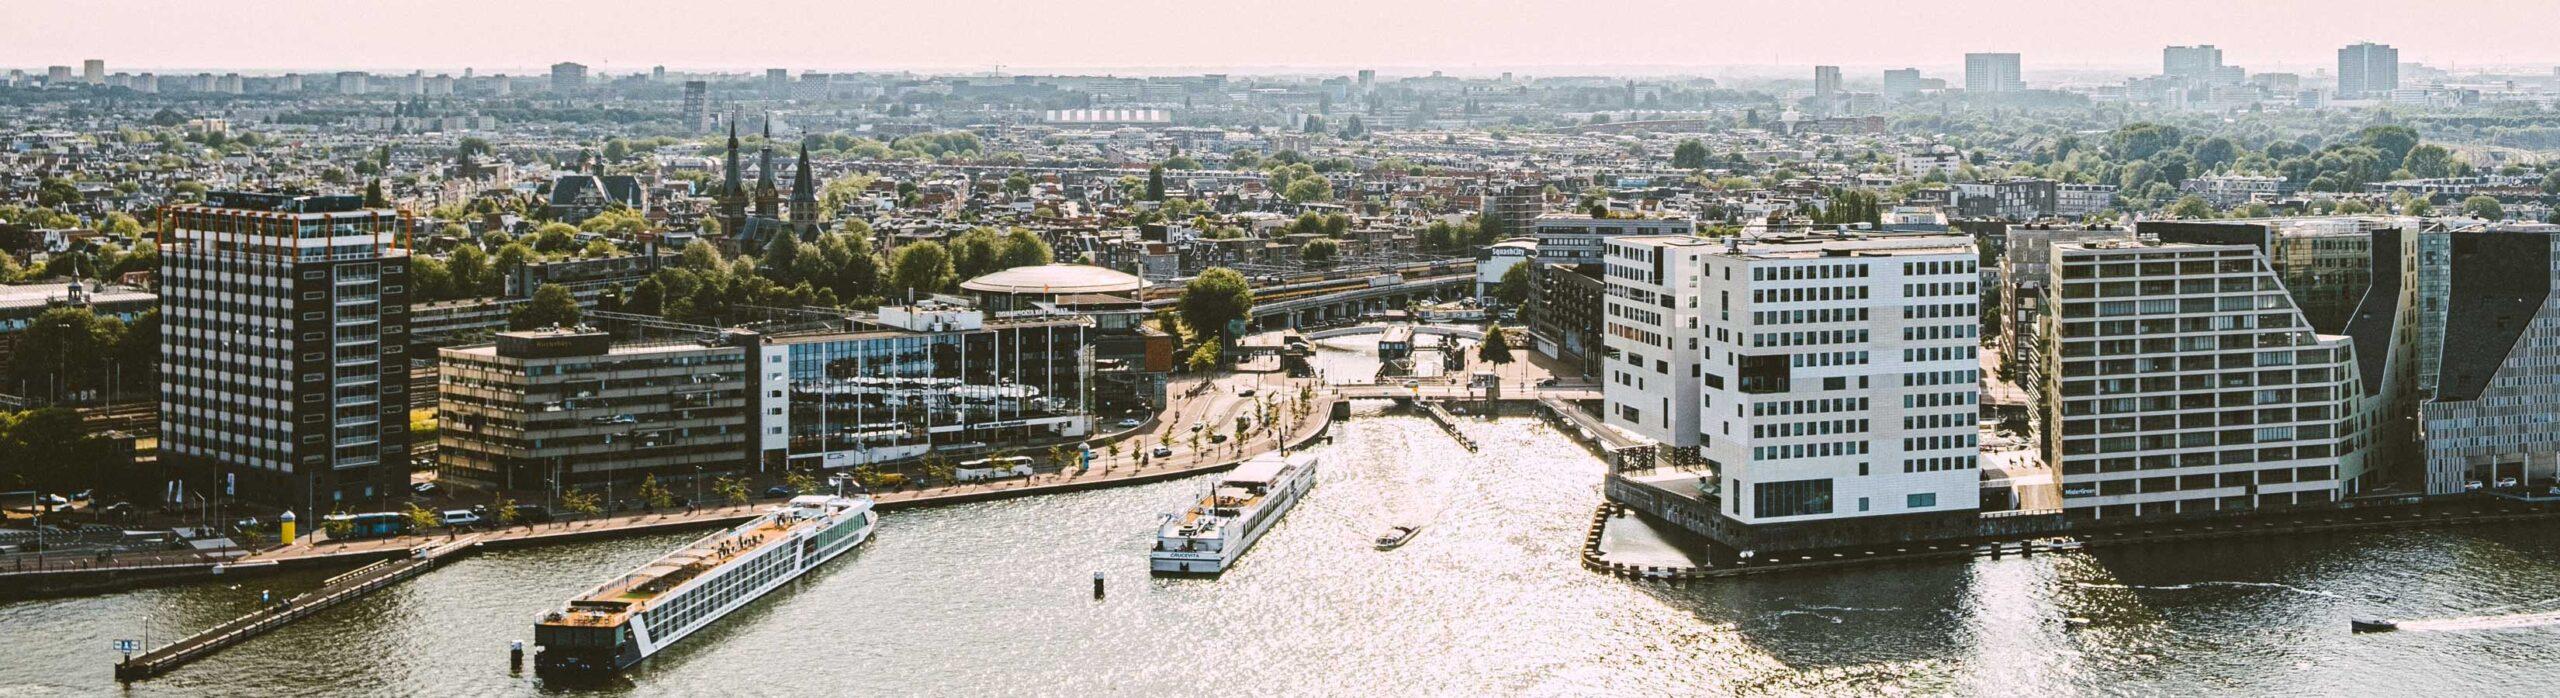 Amsterdam-Mooijekind-Vleut-Spotlights